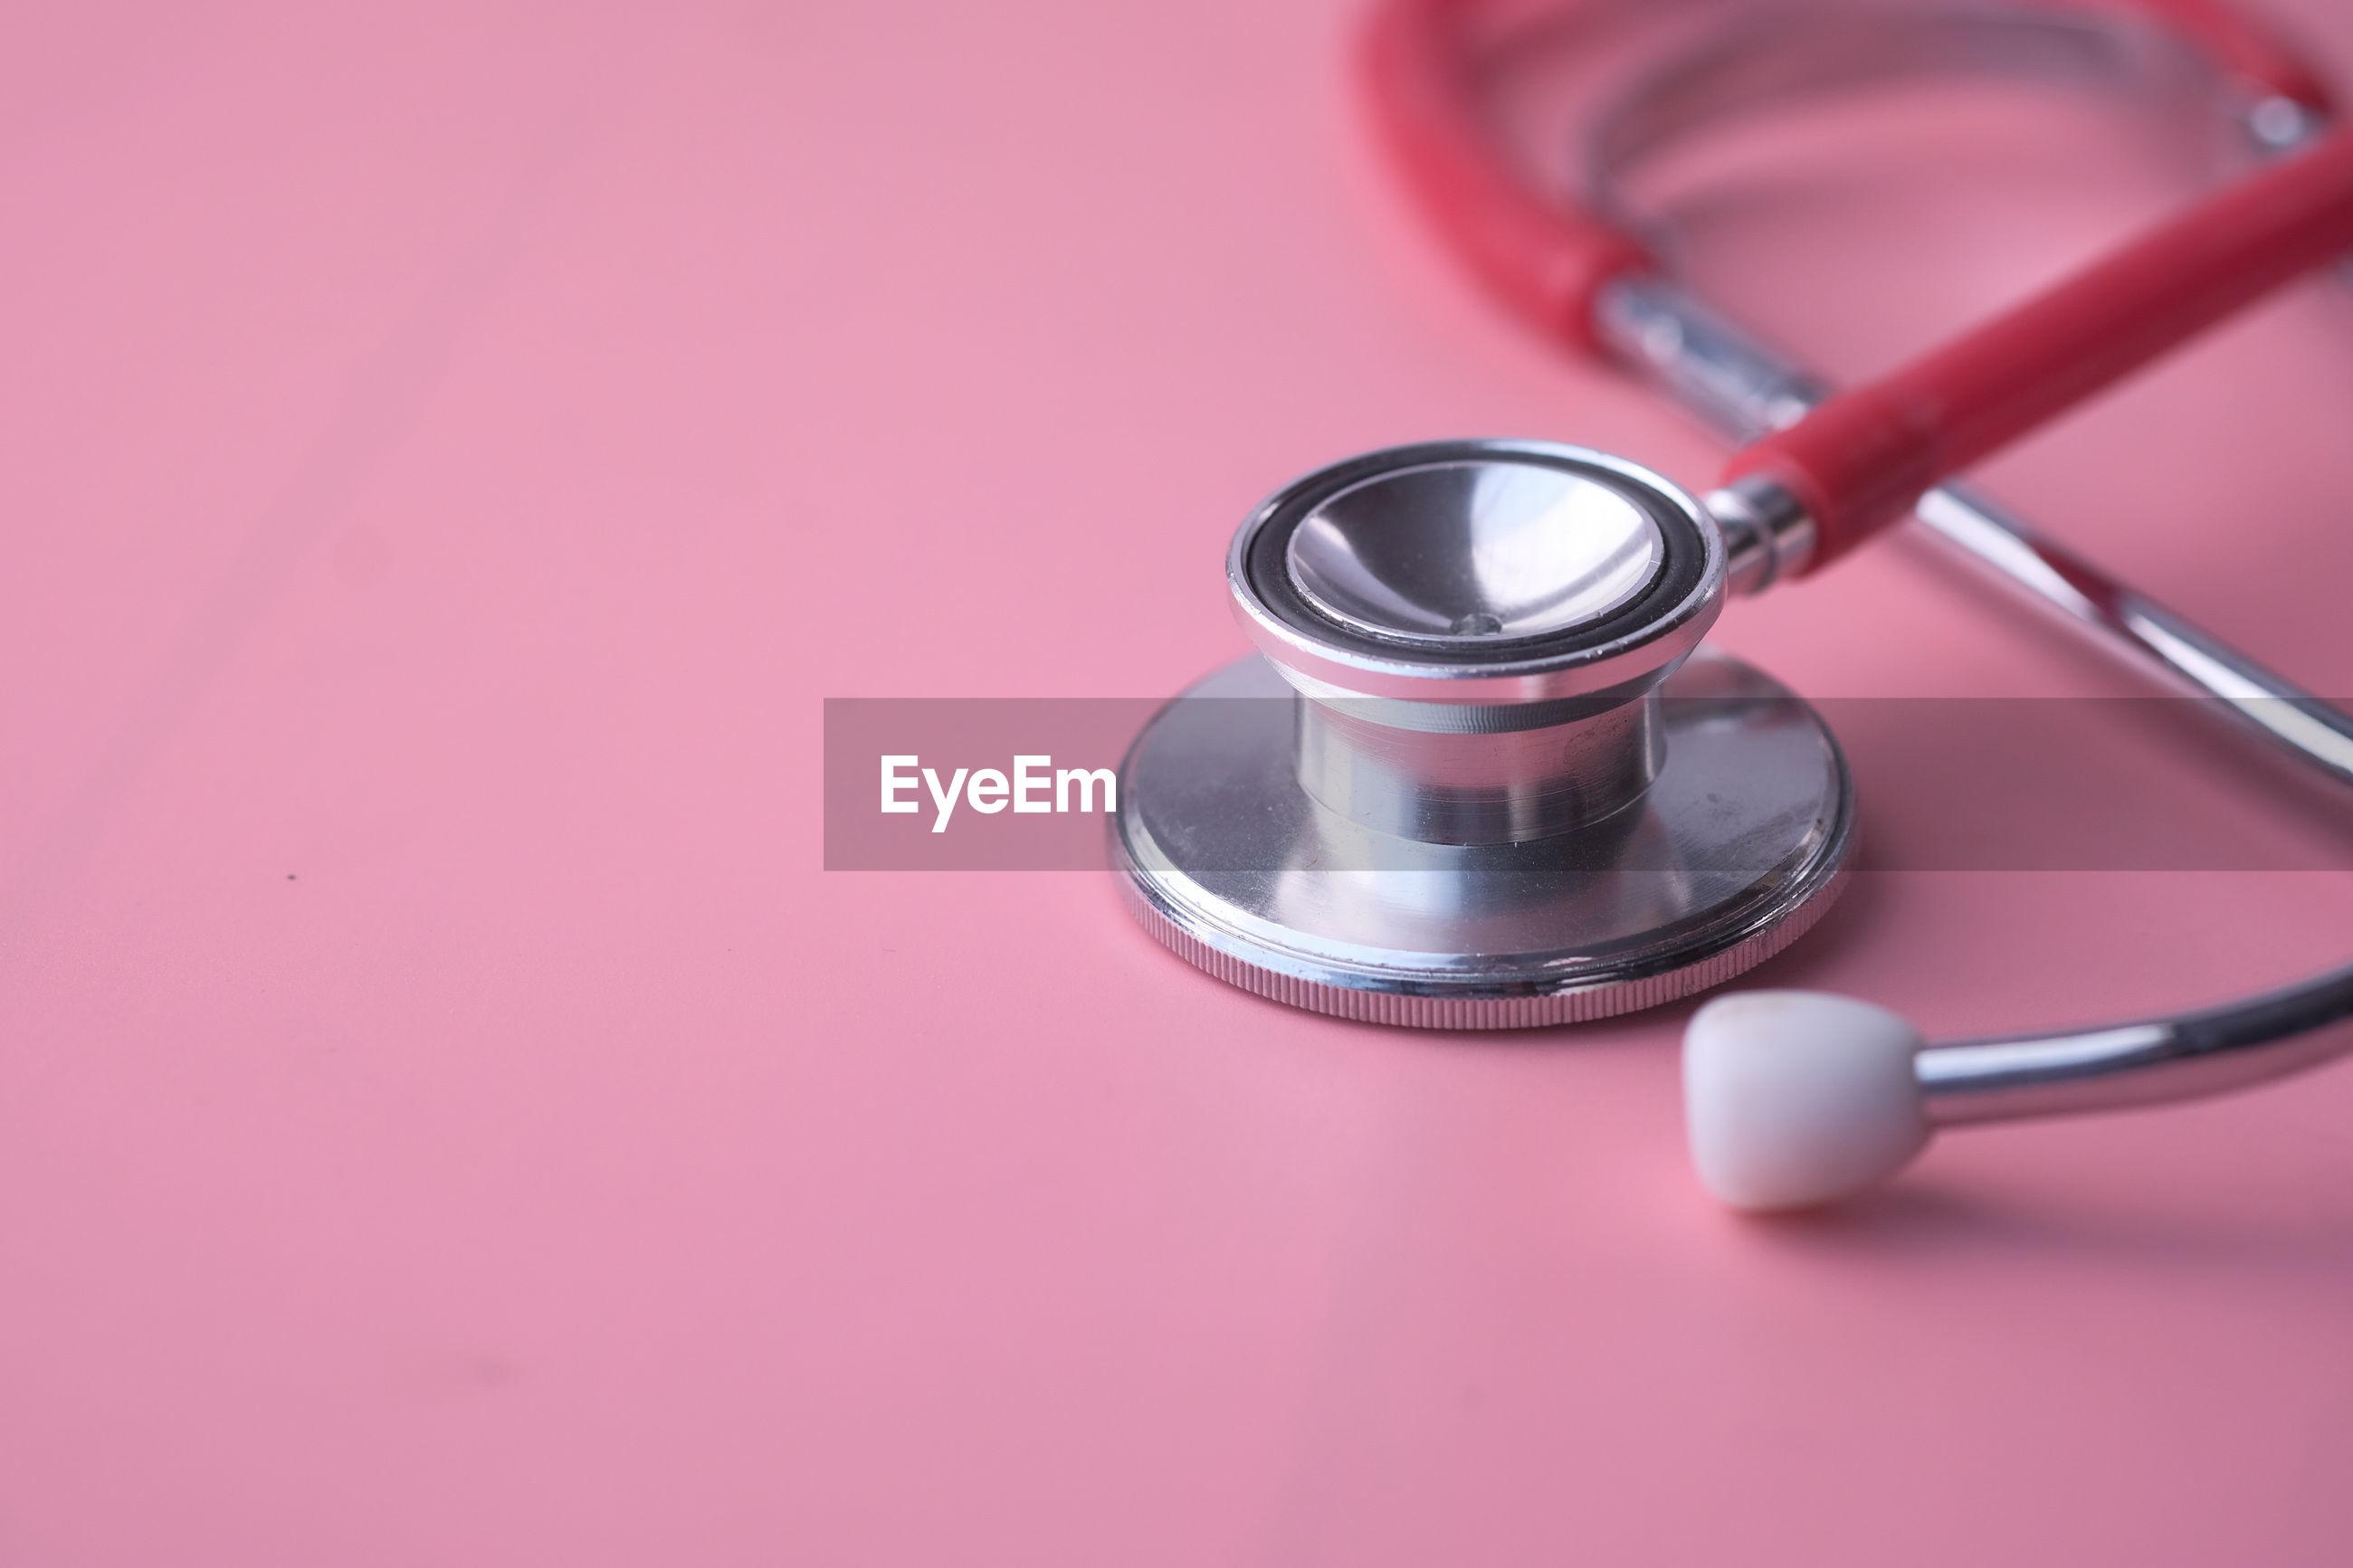 Stethoscope on pink background